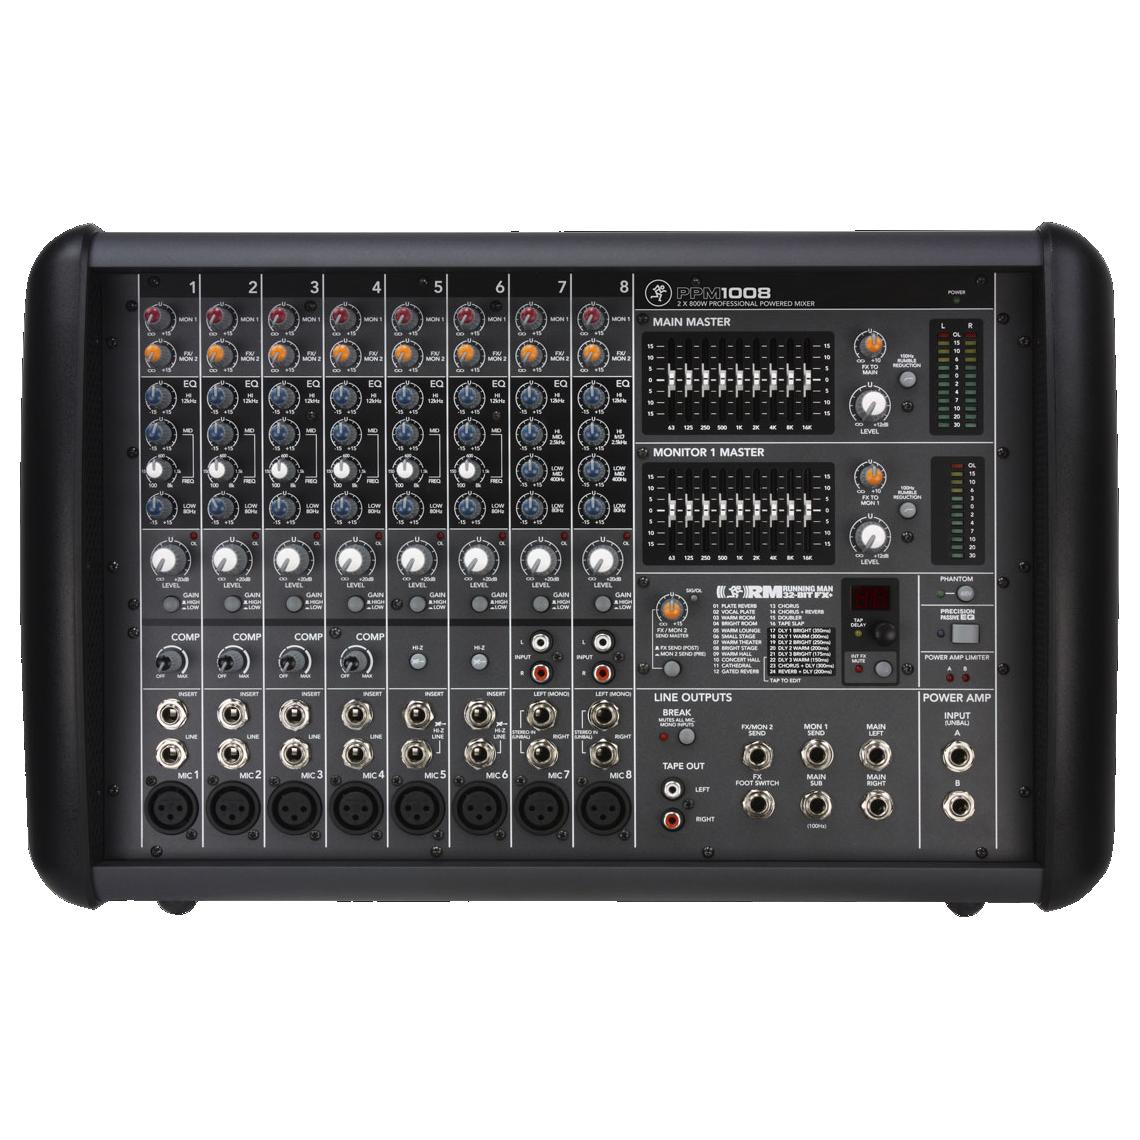 Mackie PPM1008 powermixer